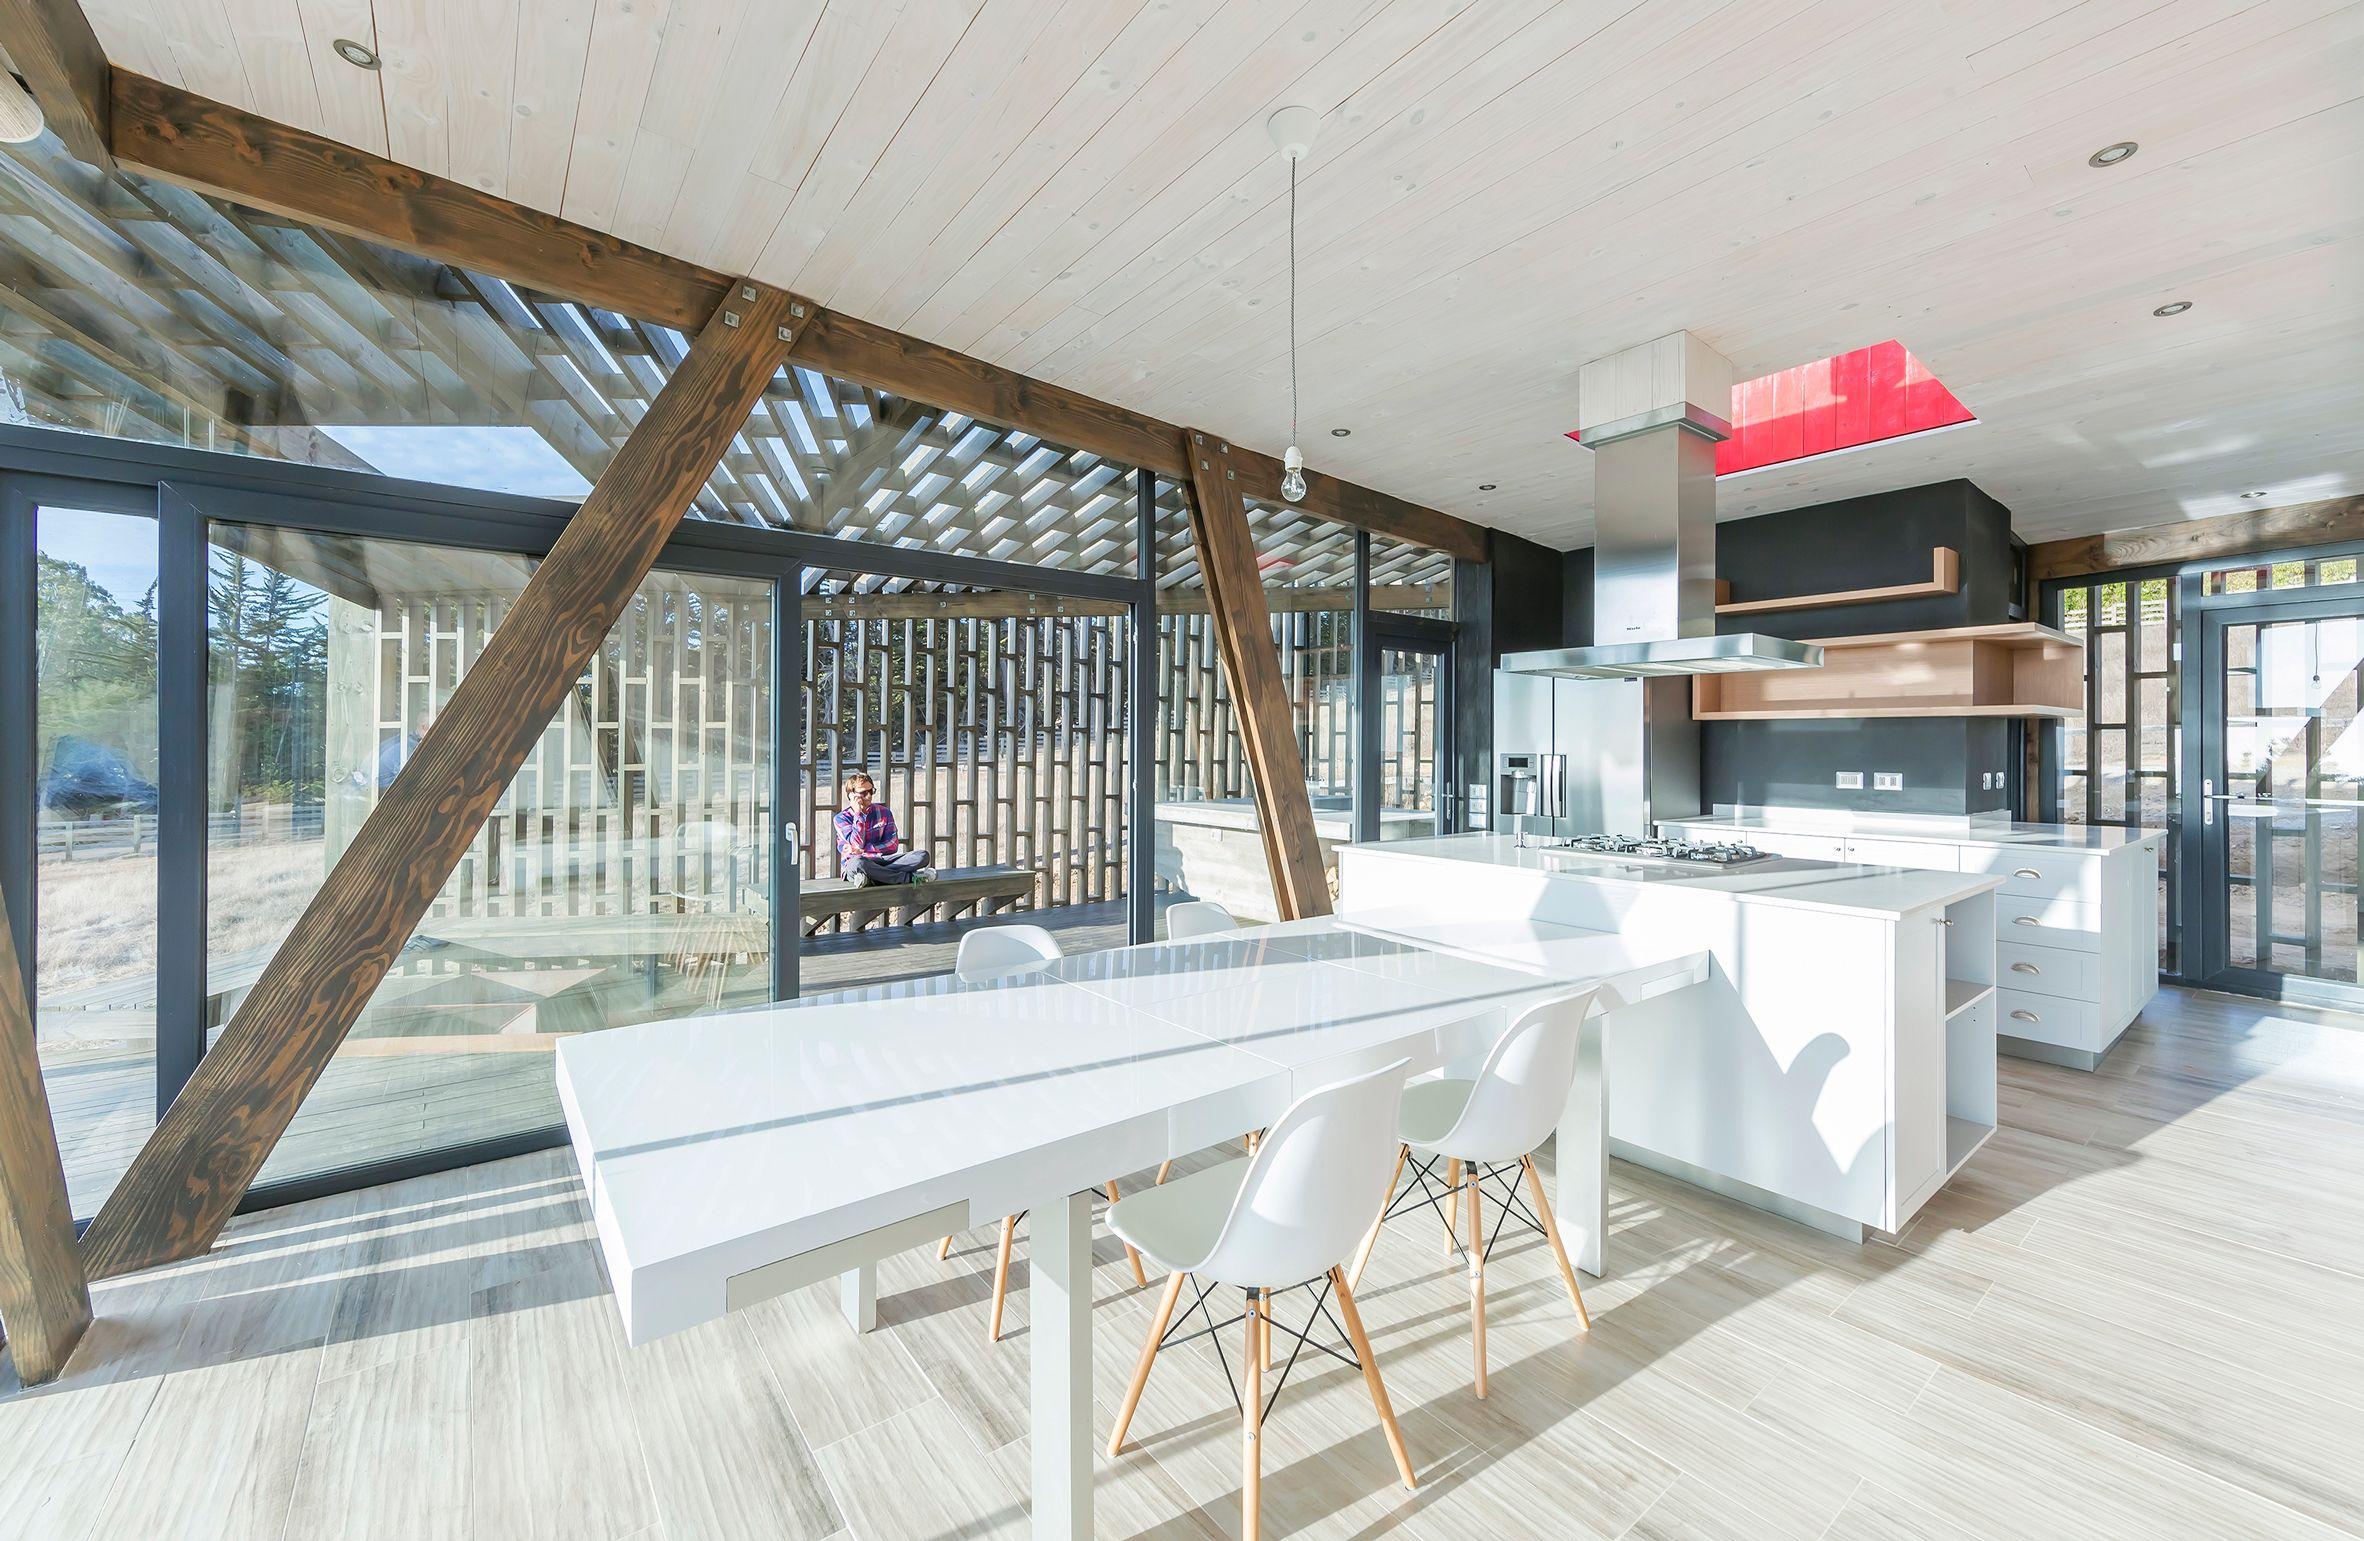 Good Photography: Sergio Pirrone ||| Sweet Home Make Interior Decoration, Interior  Design Ideas, Home Decor, Home Decoration Ideas, Design Decoration Ideas,  ...